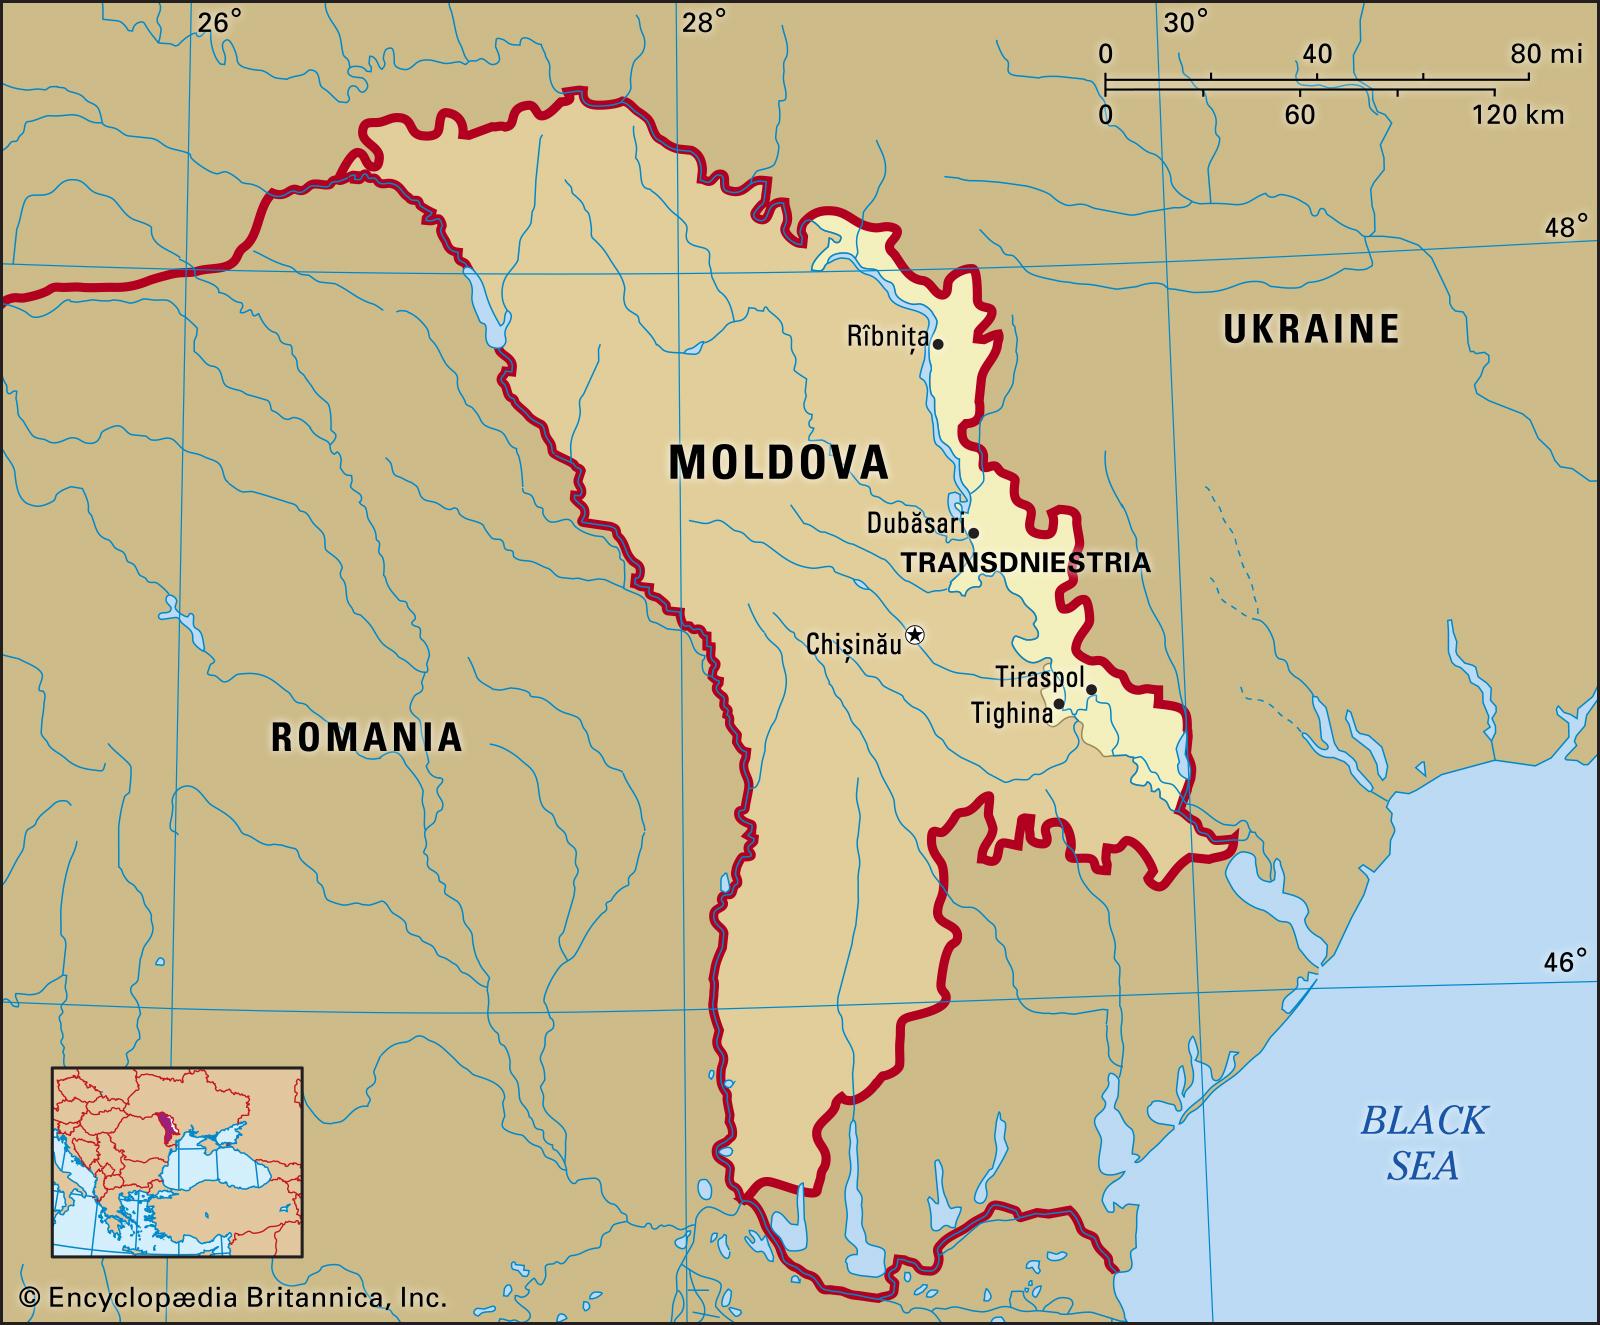 Map of Transnistria